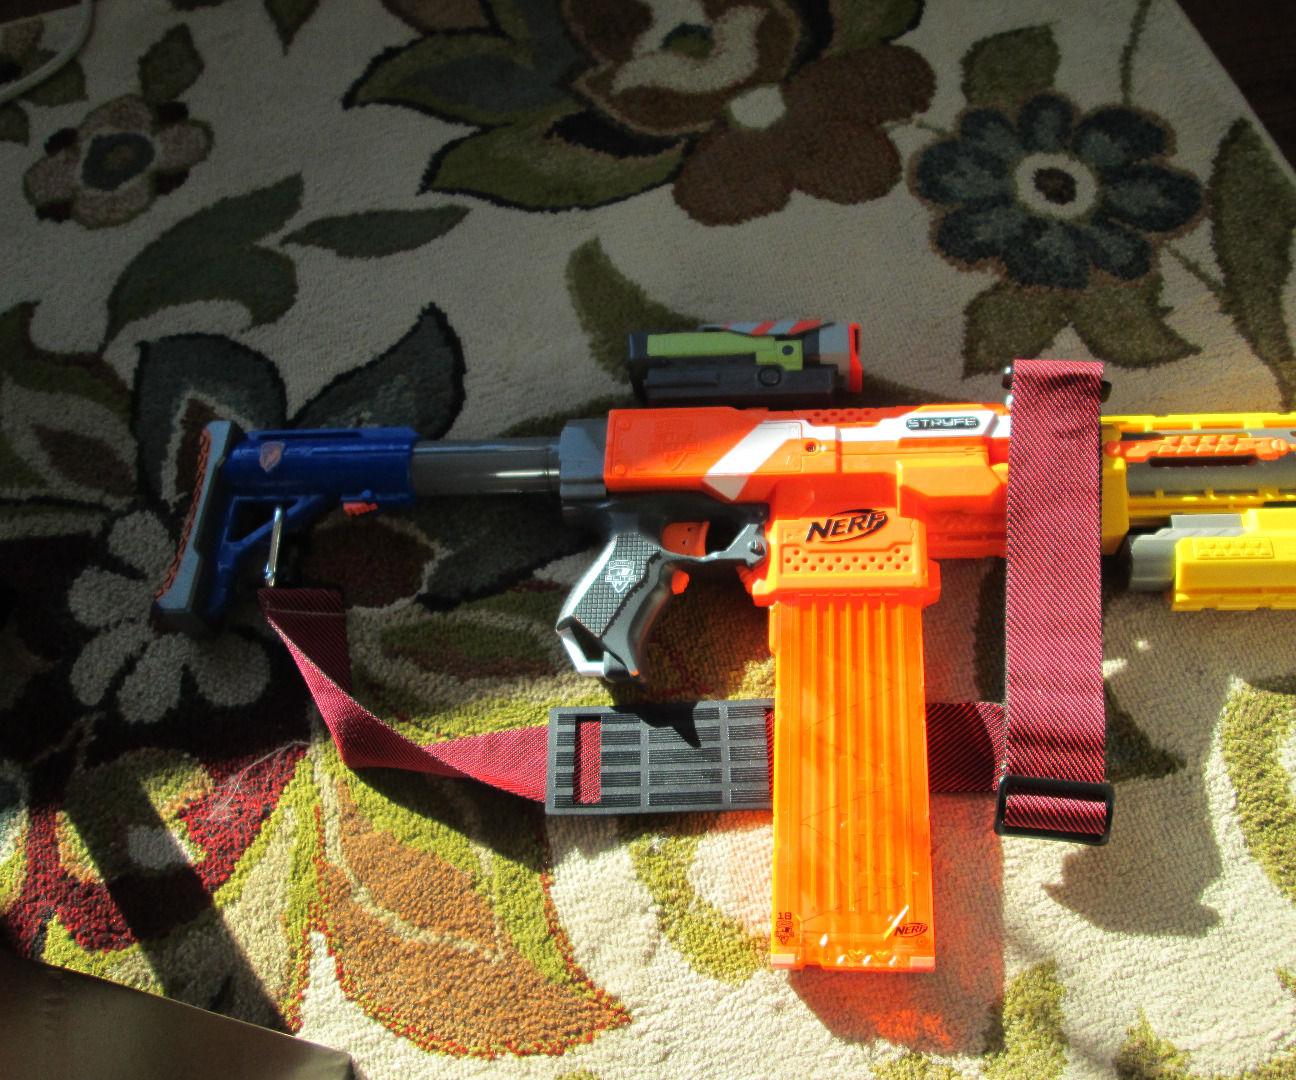 Nerf Assault Rifle - the NEC-18